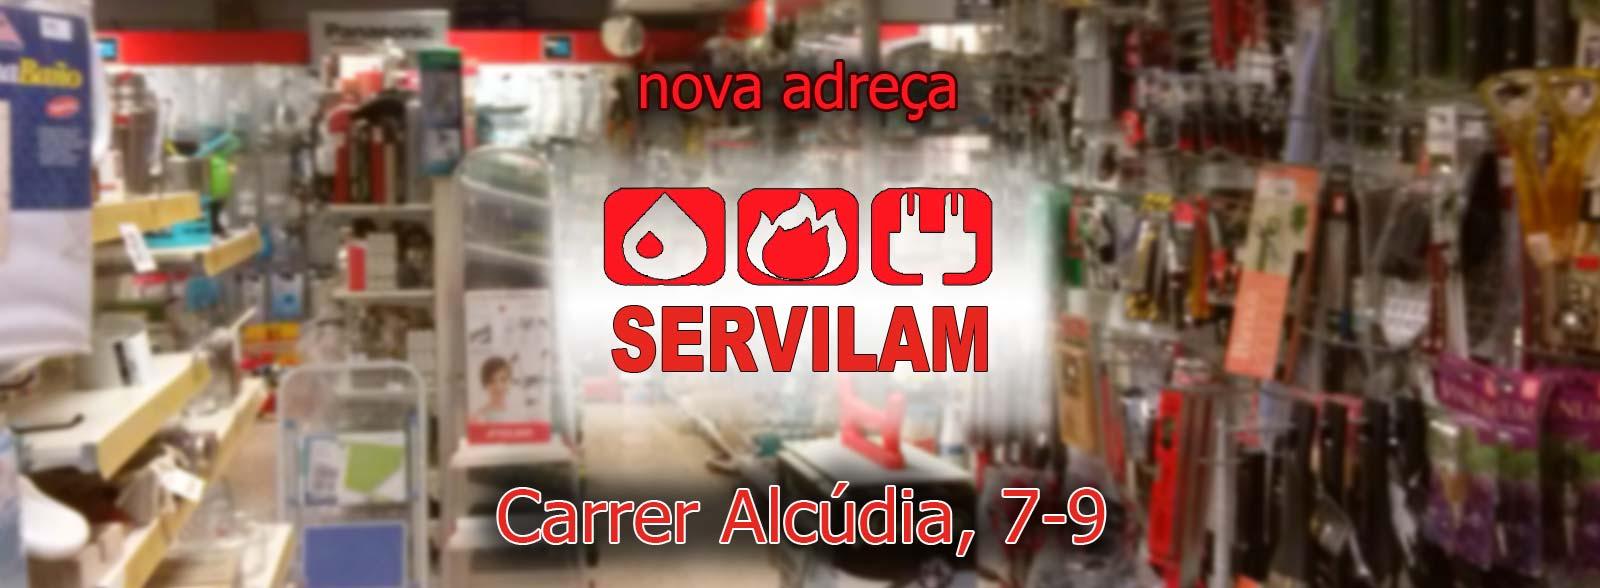 logotipo de SERVICIO LAMPISTERIA SA